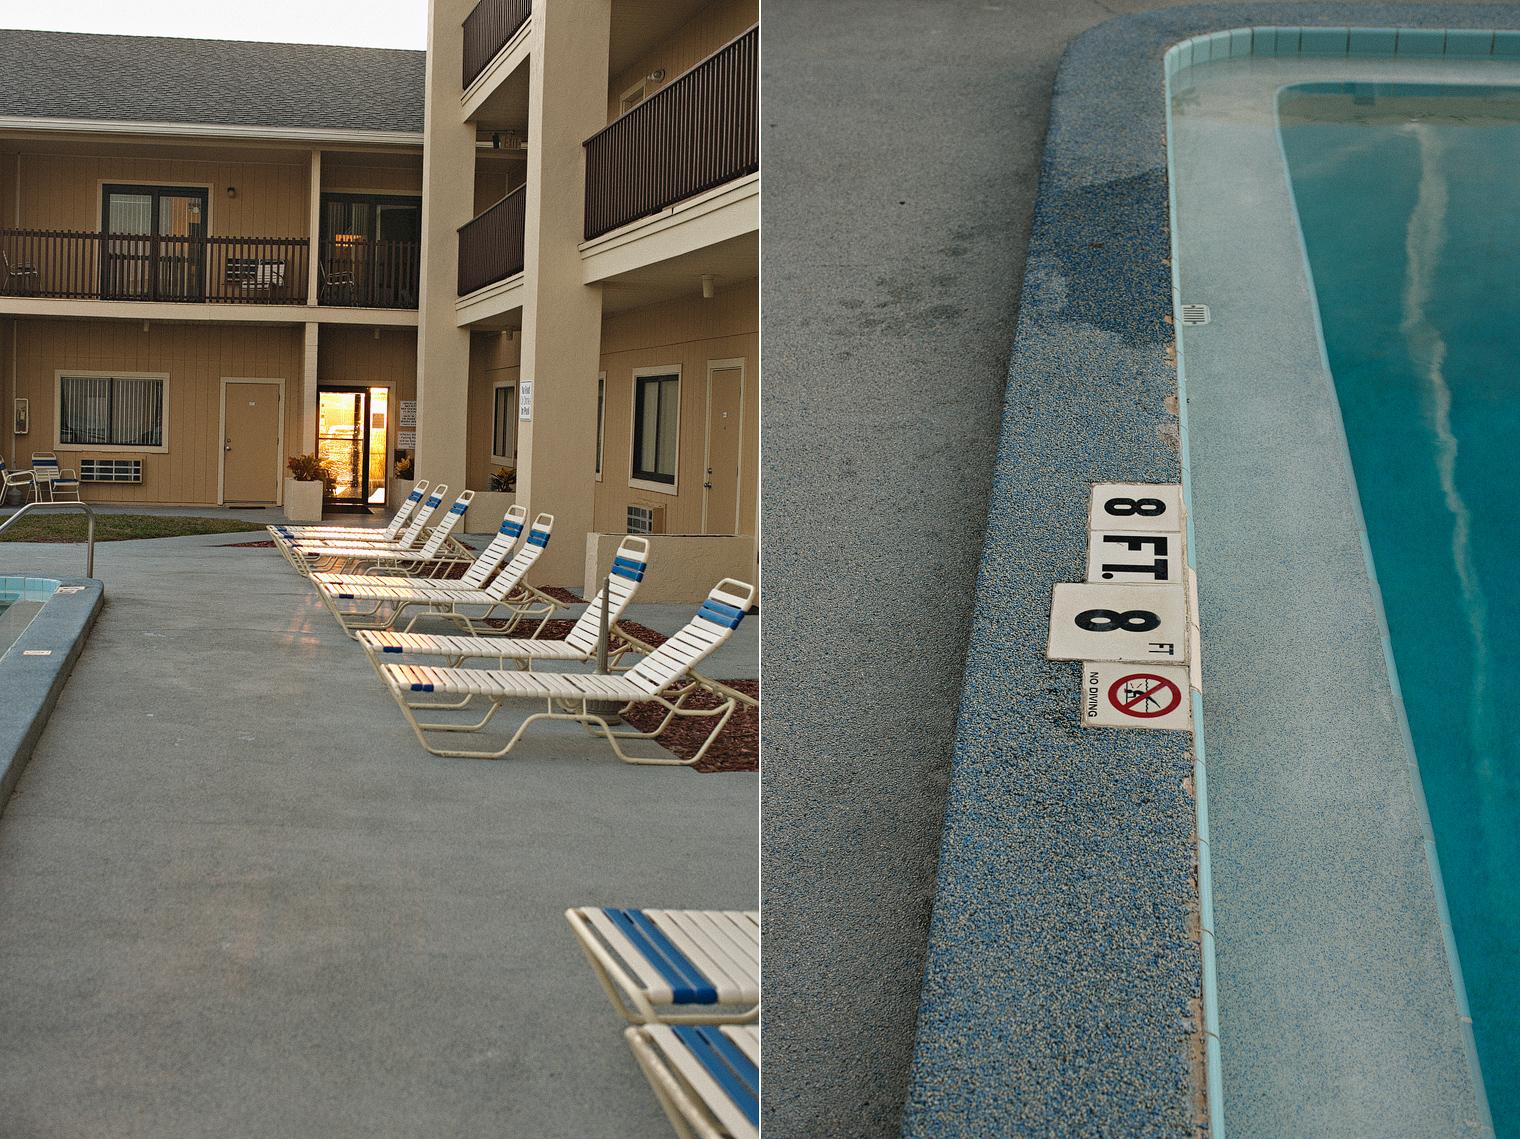 New-Smyrna-Beach-Photographer005.jpg